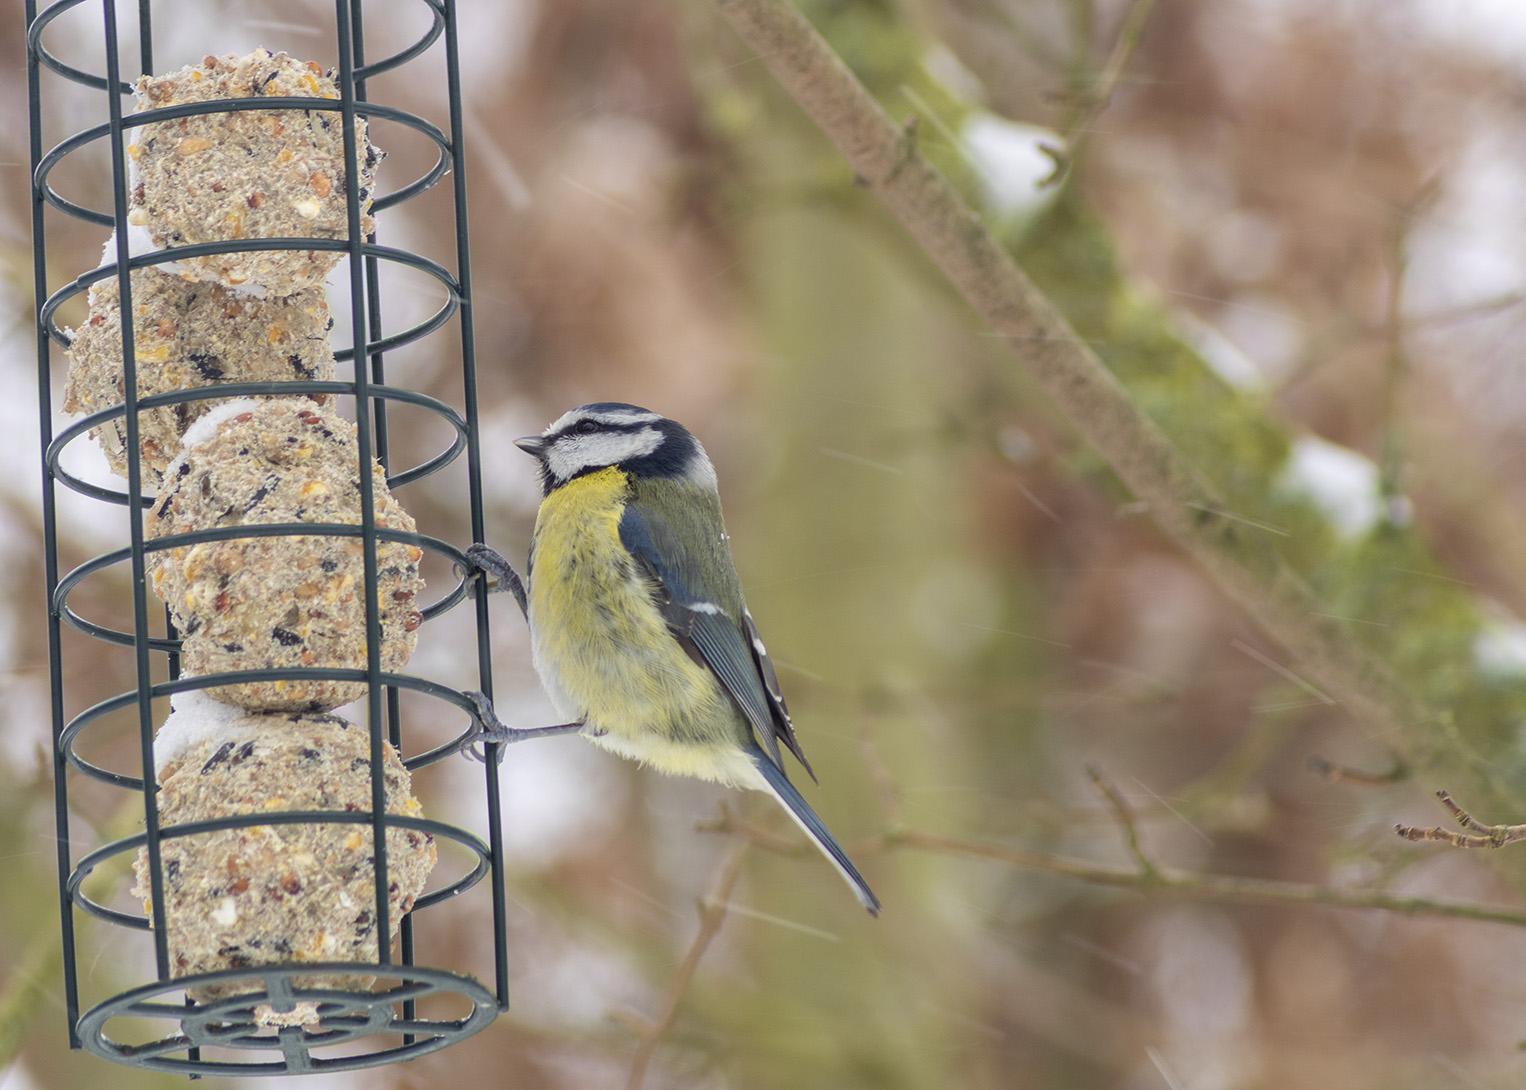 Blue tit on bird feeder at Quaker Wood in winter